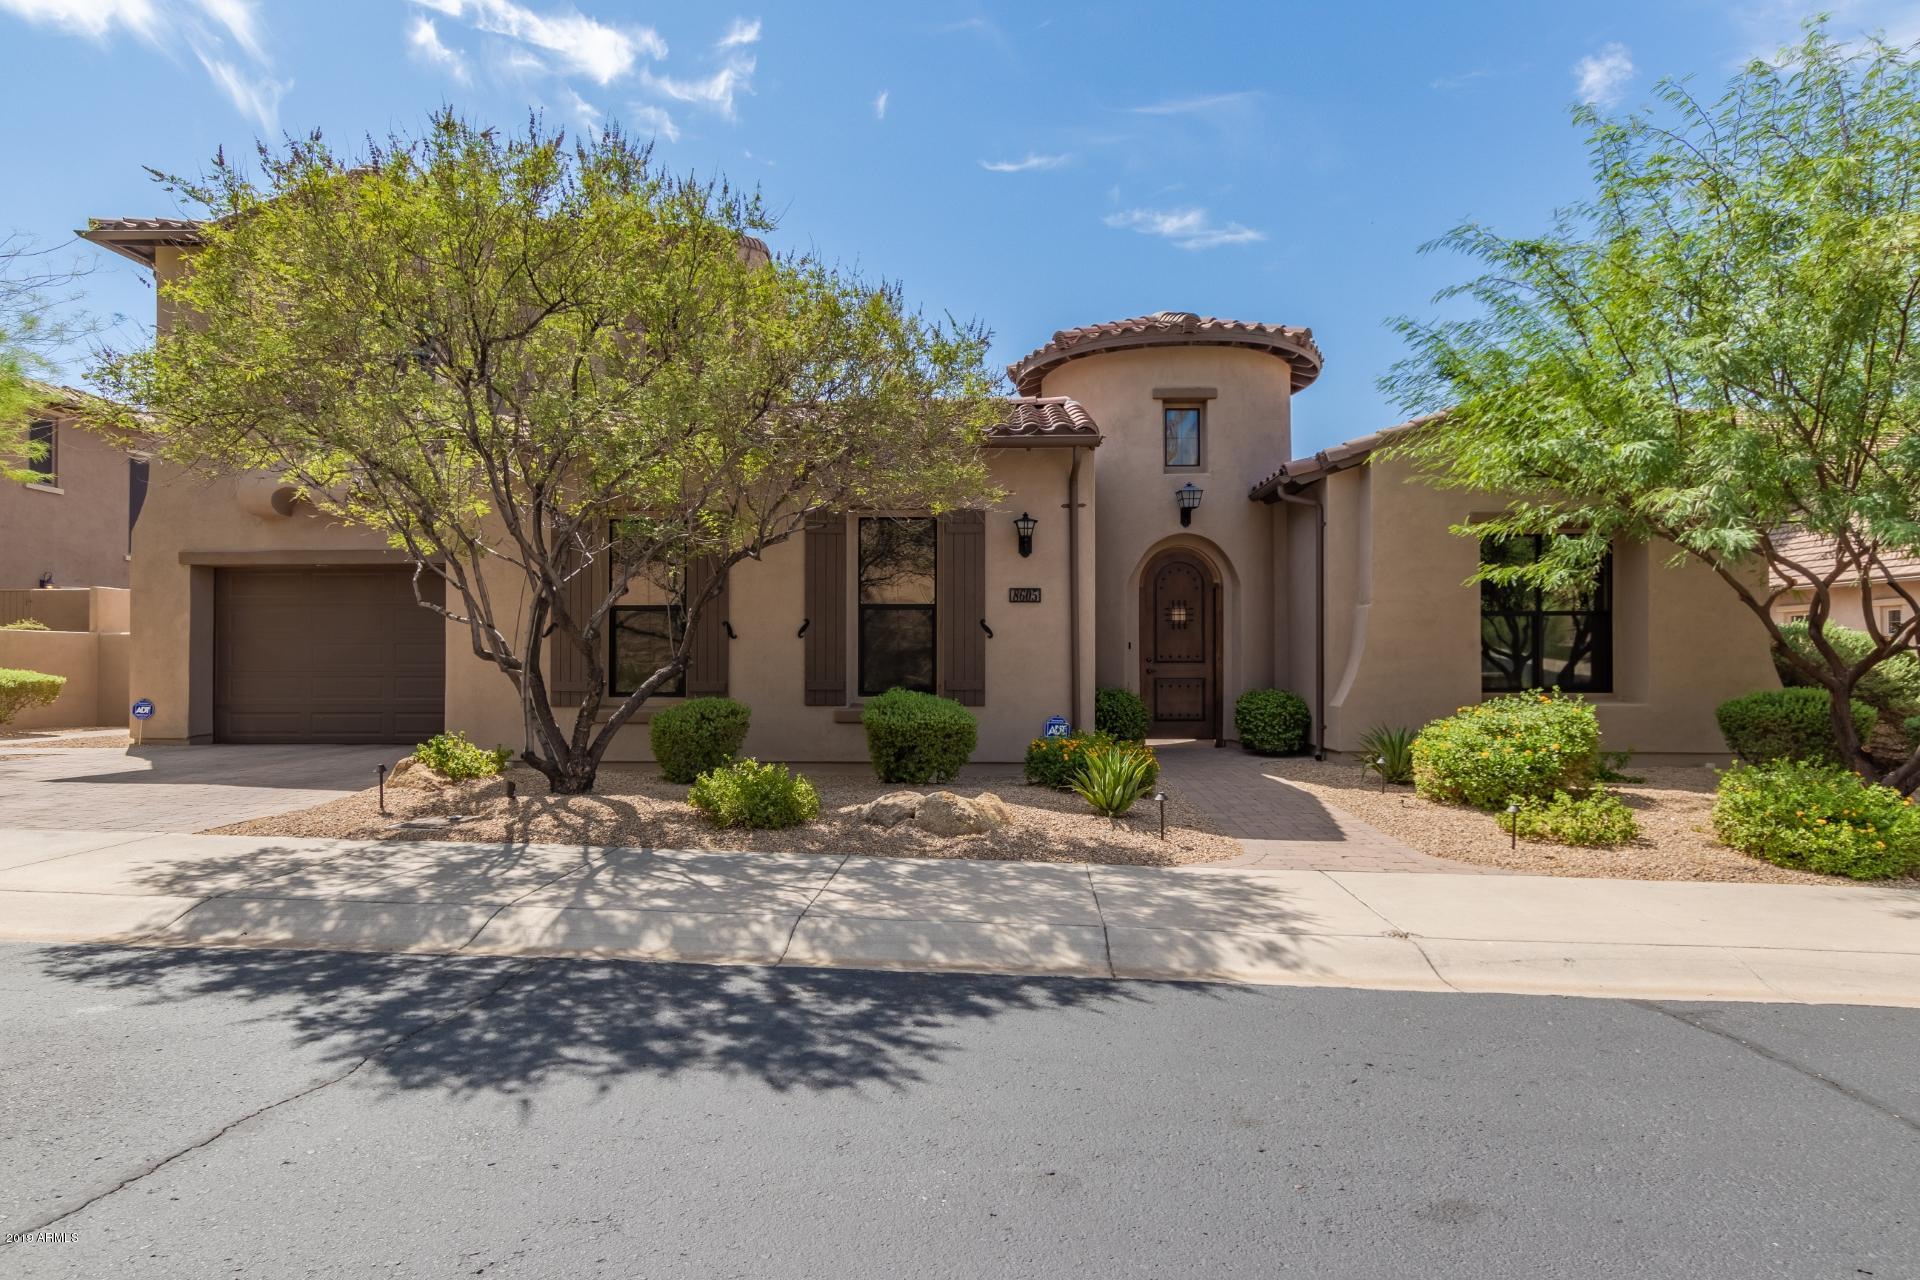 Photo of 8605 W BENT TREE Drive, Peoria, AZ 85383